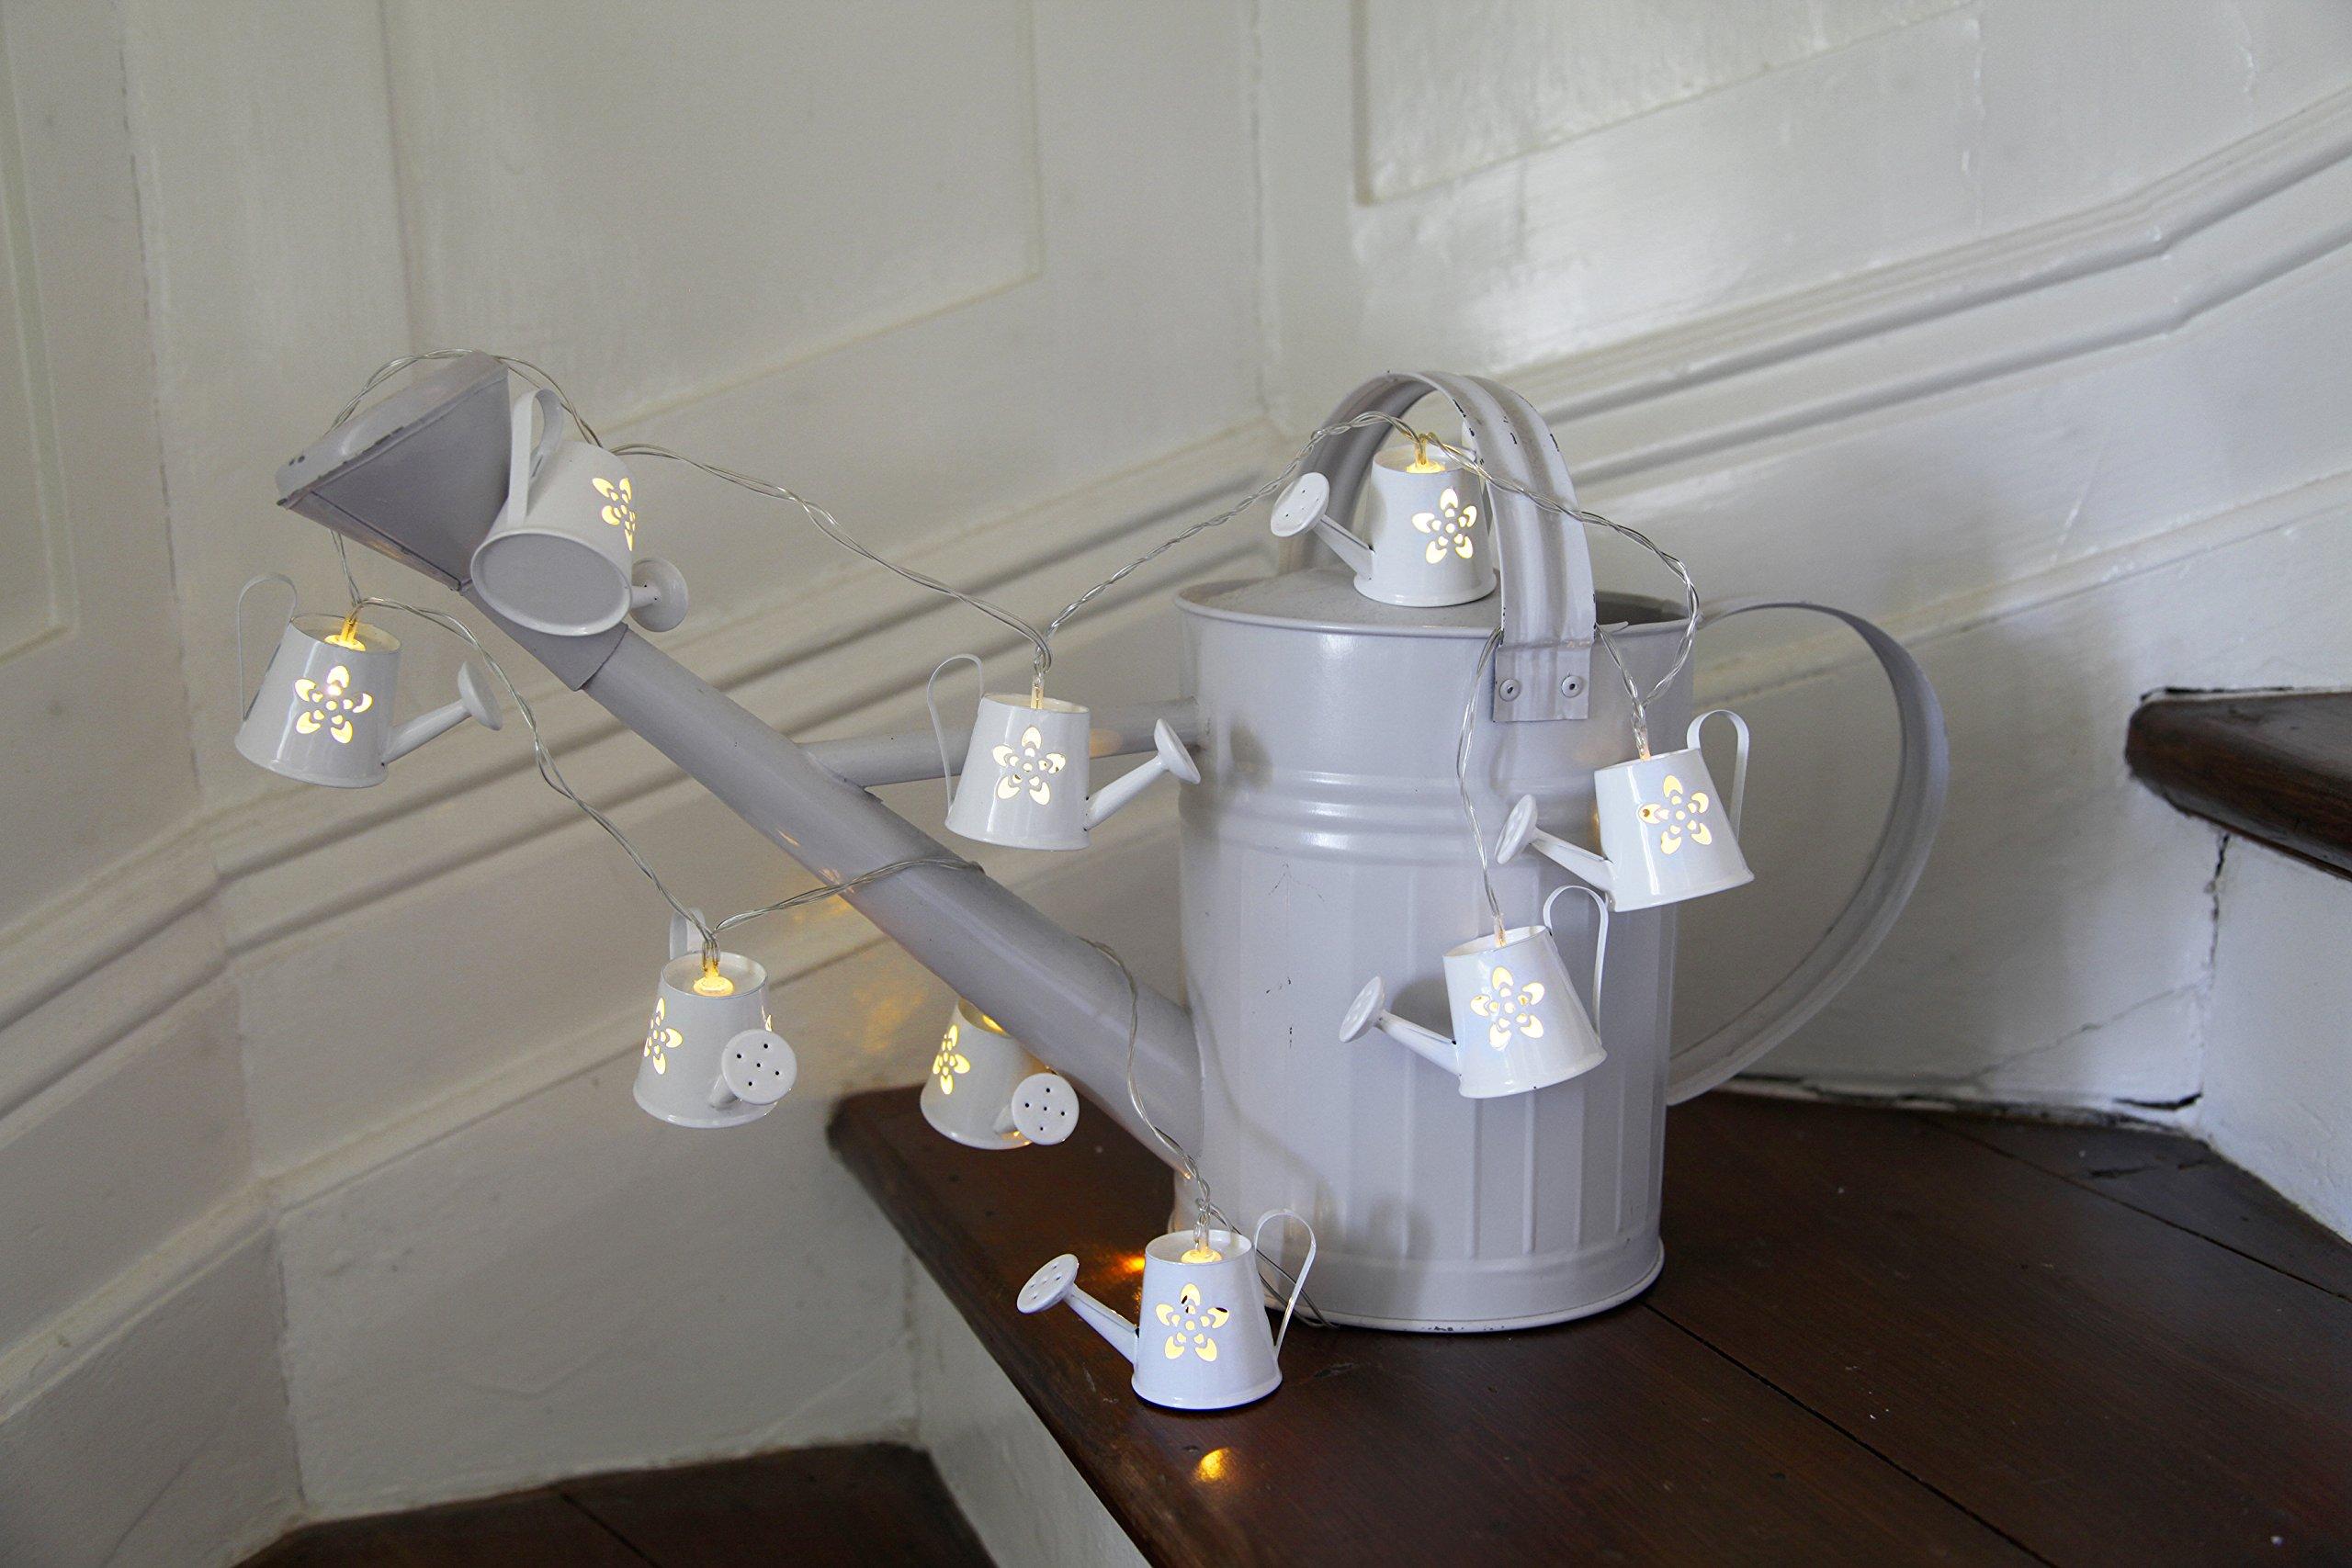 LED-Lichterkette-Water-Cans-8-warmwhite-LED-weisse-Giekannen-Lnge-ca-140-m-Timer-Batterie